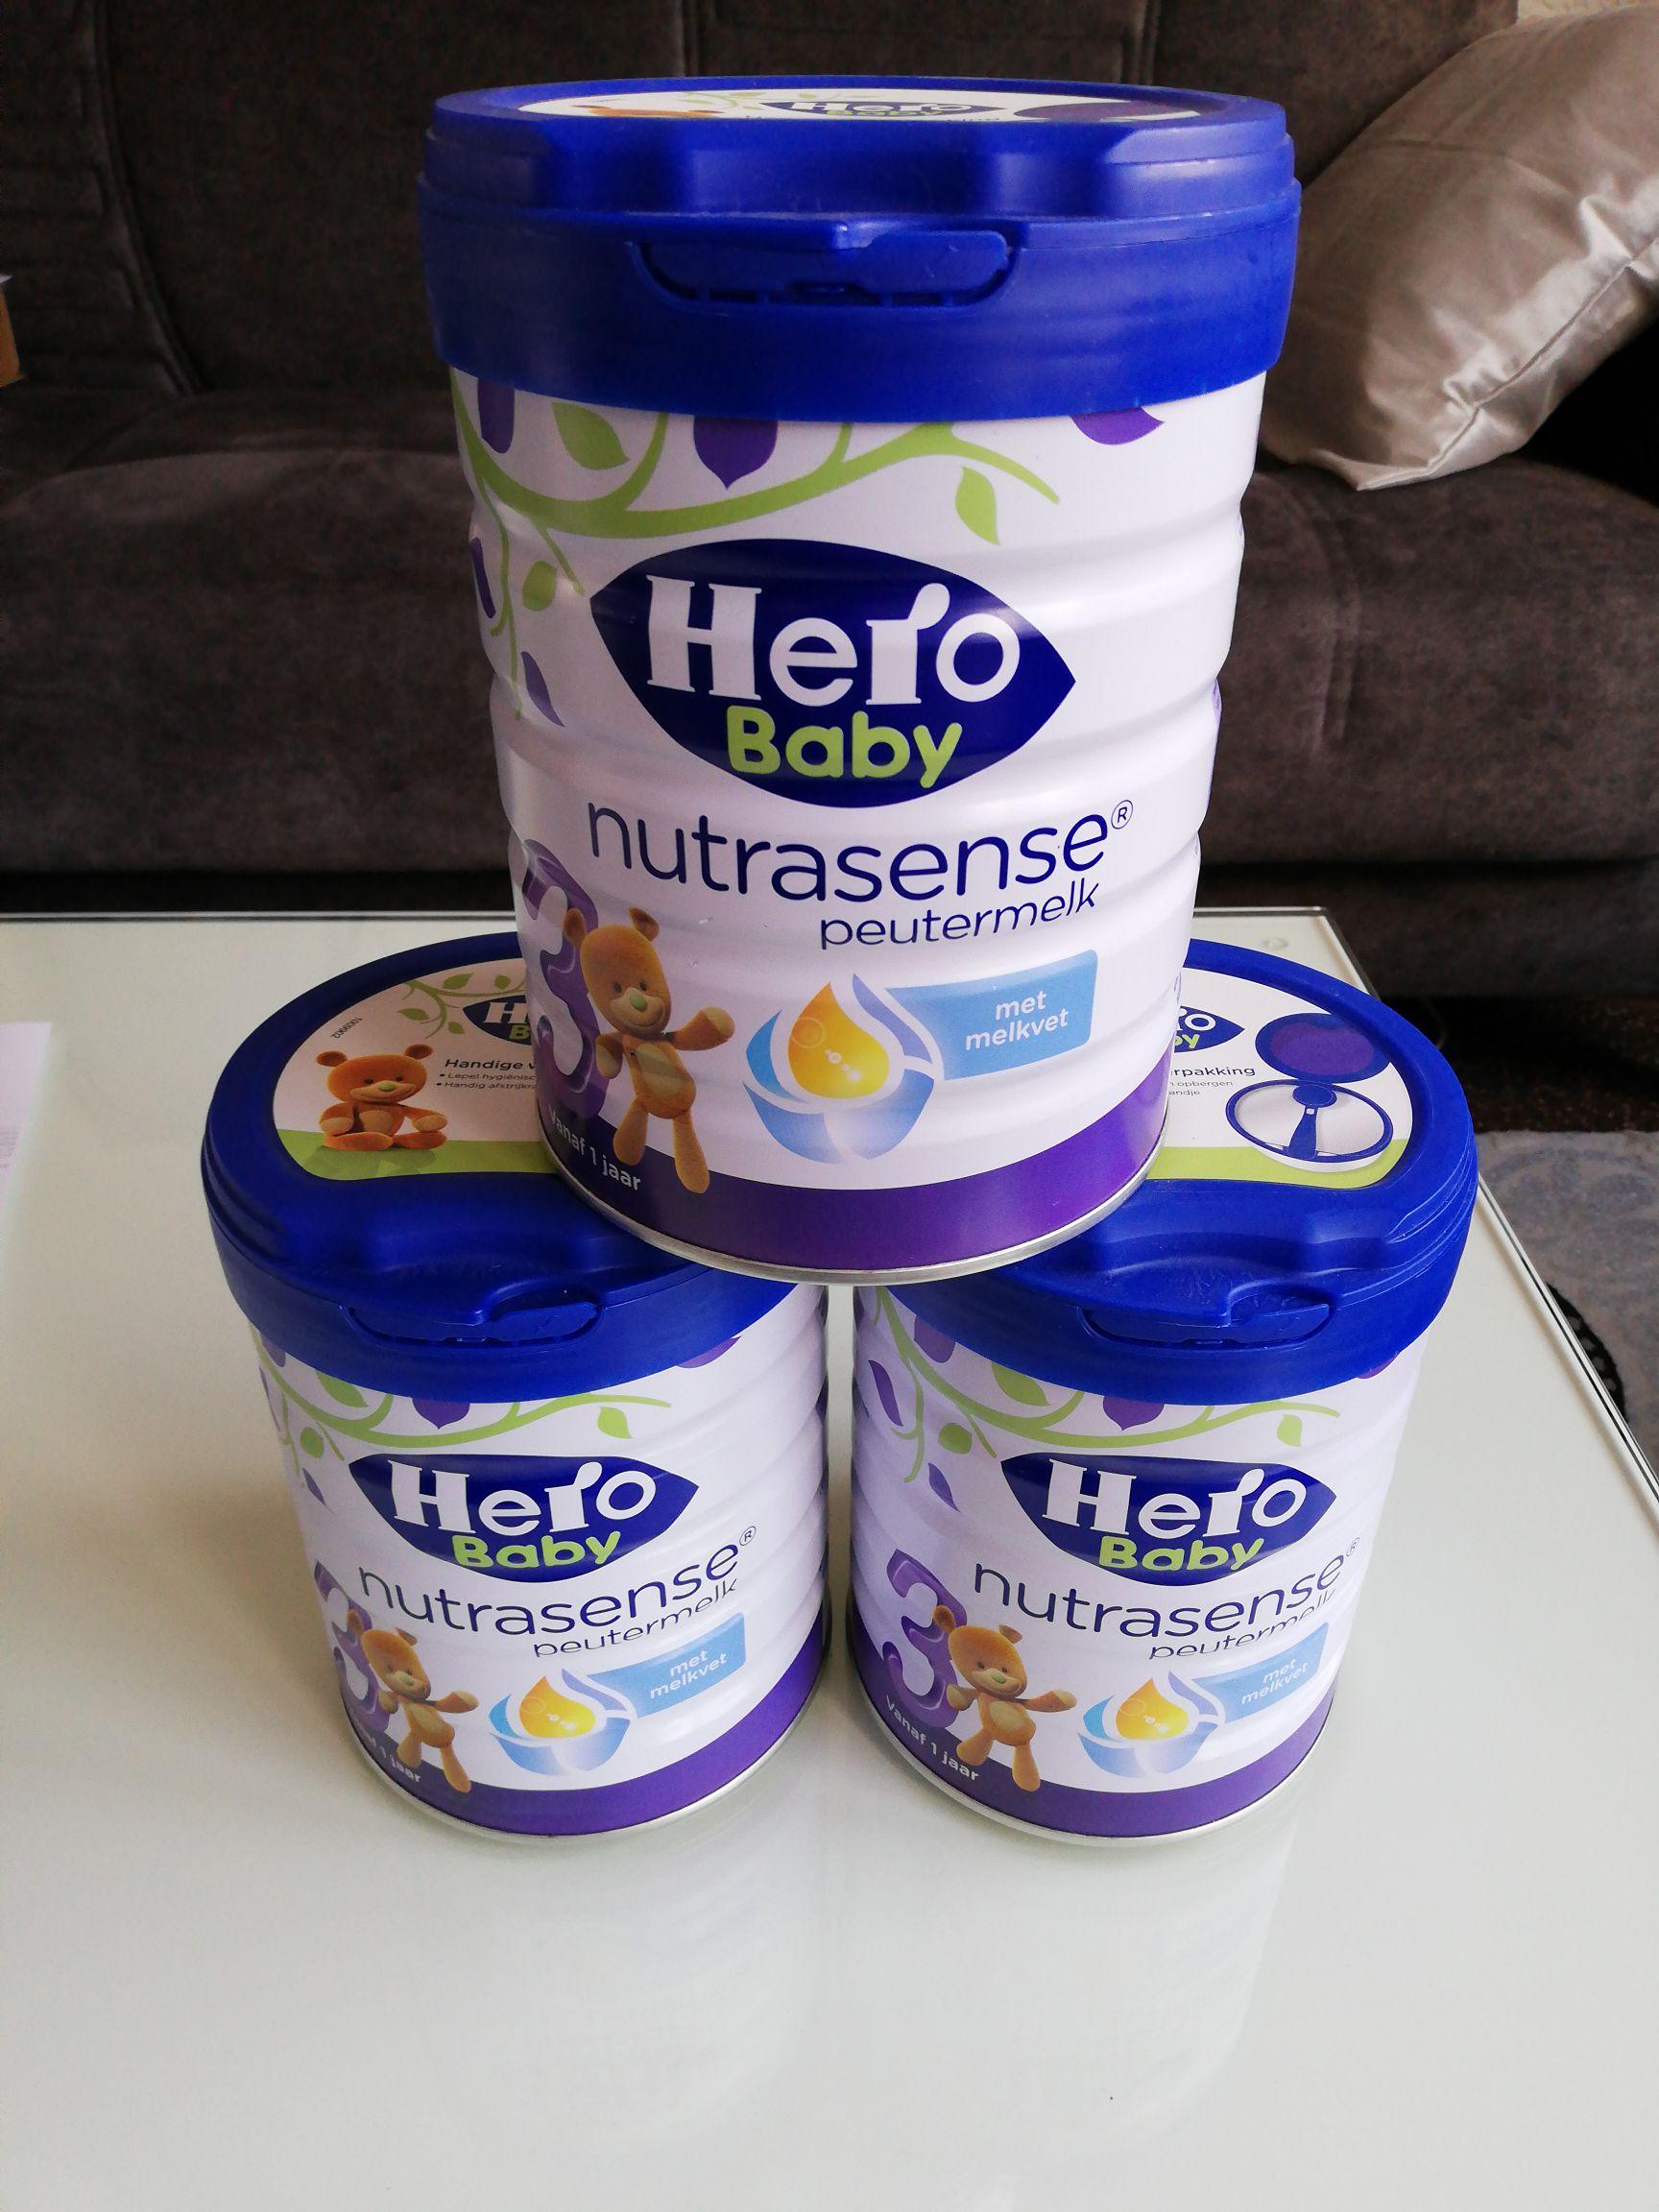 Hero Baby Nutrasense #3